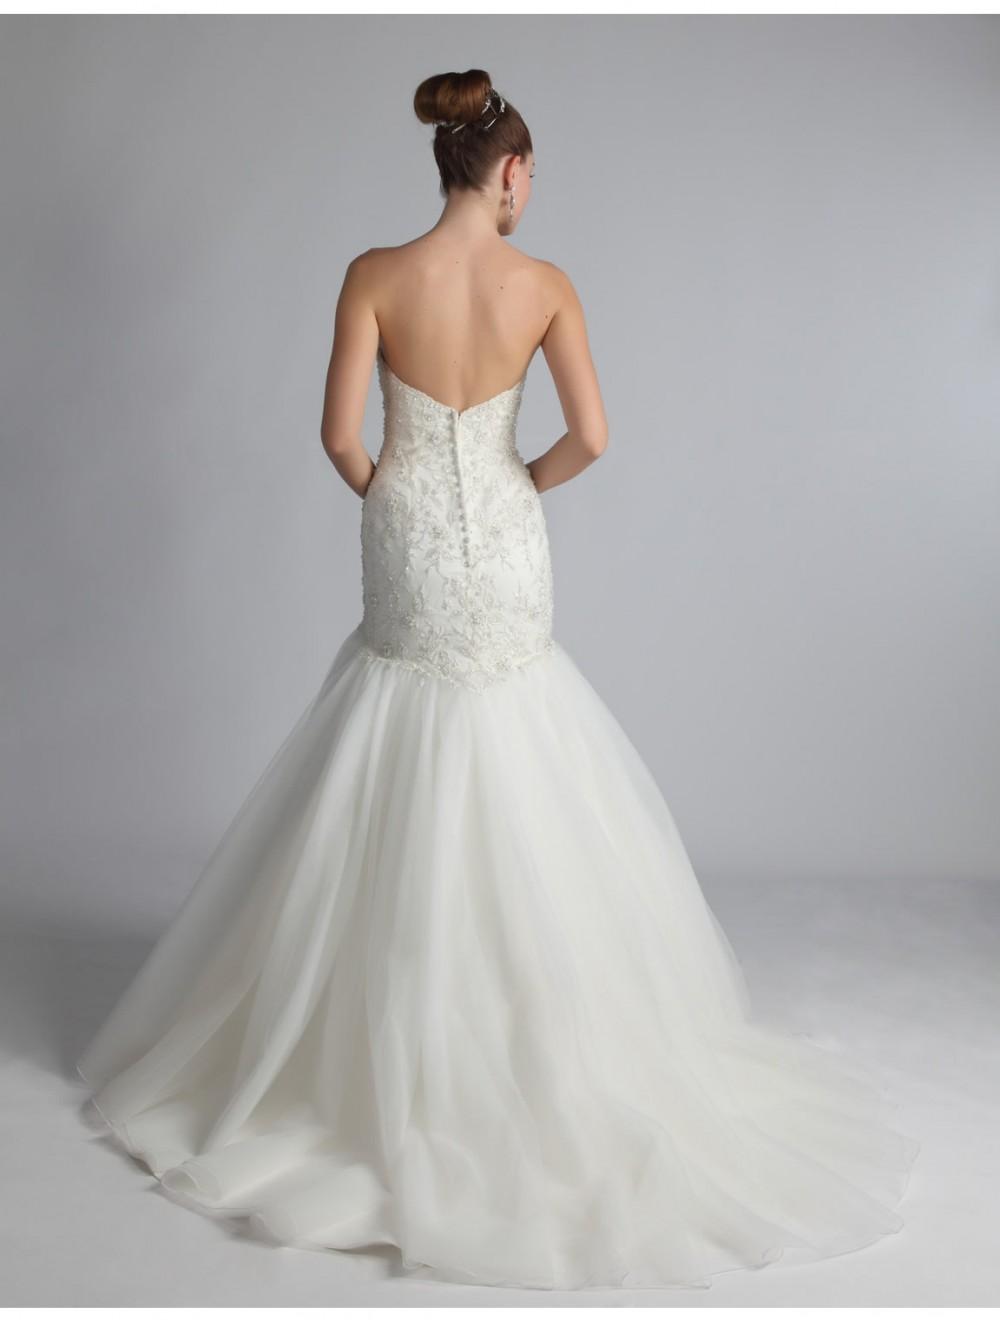 VE8185B1-venus-bridal-wedding-dress-Moscatel-Ottawa-store